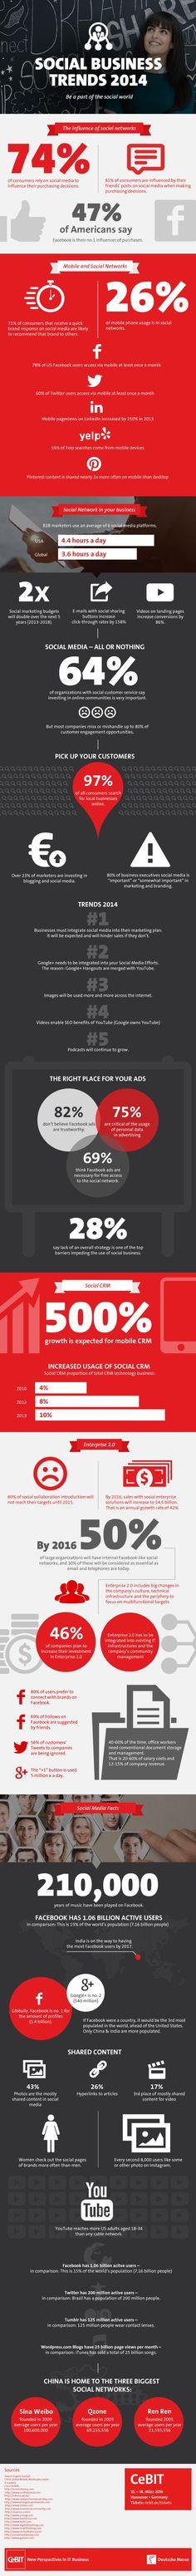 Social Media Business Statistics, Facts, Figures & Trends 2014